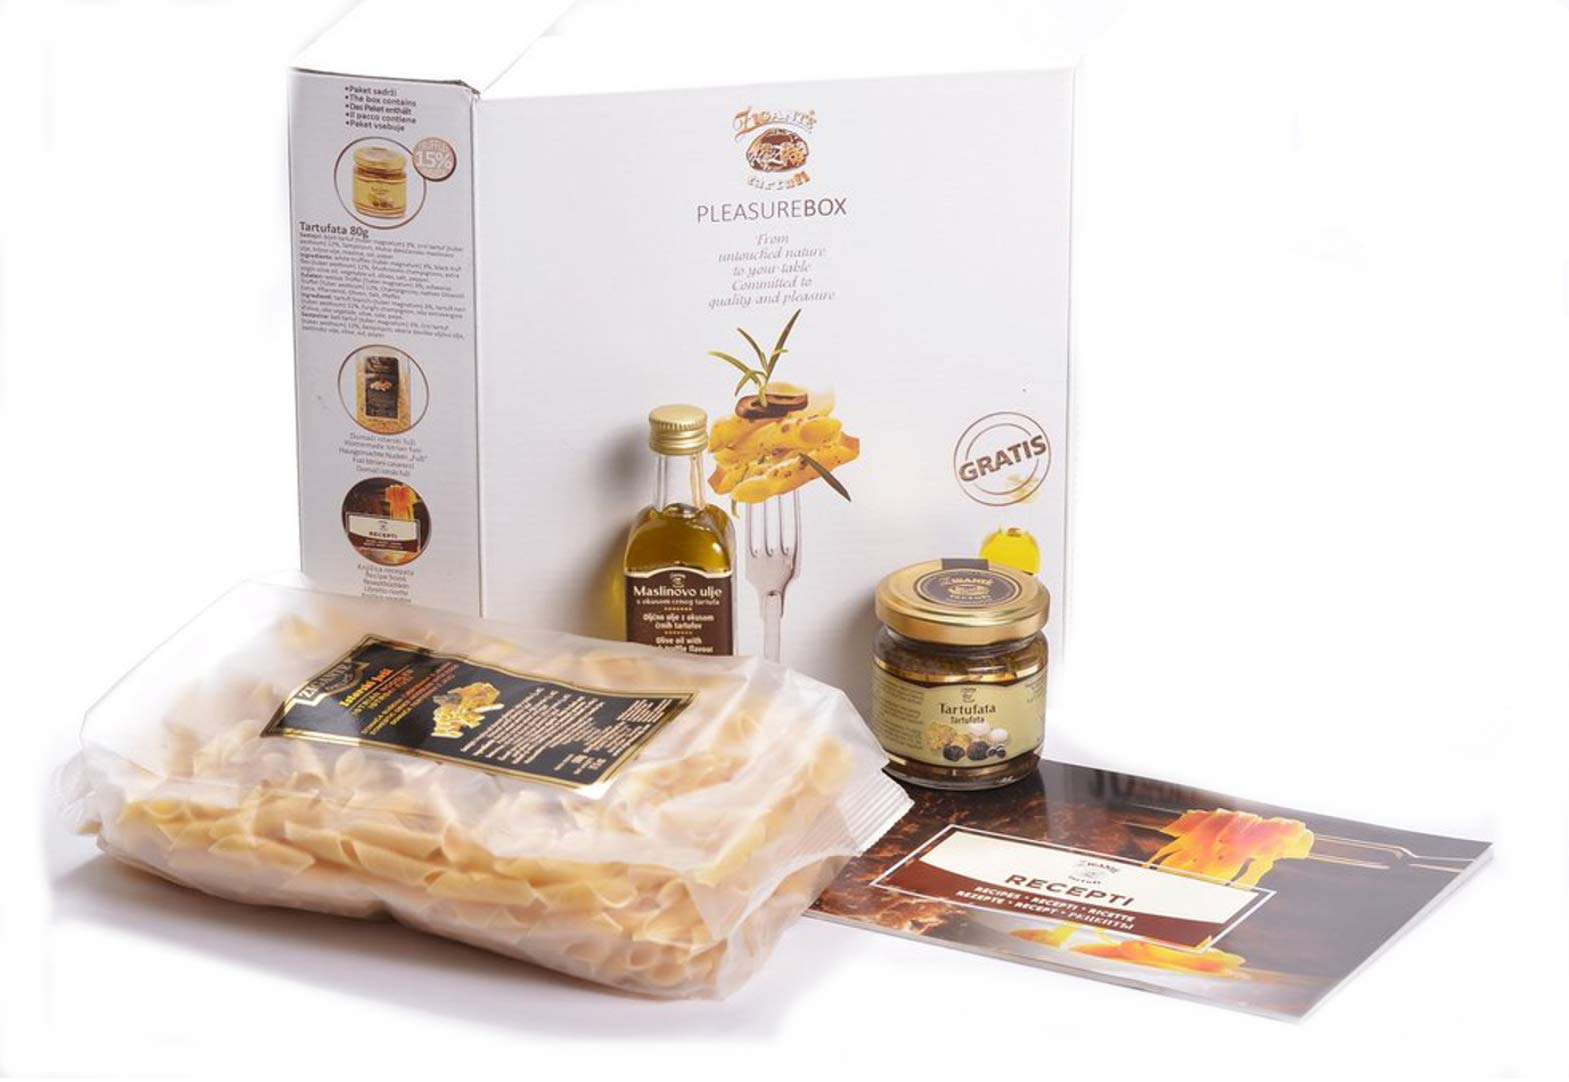 Truffle Mushroom Gift Box, Truffle Pasta Meal for 4! Croatian Luxury Gourmet Foods